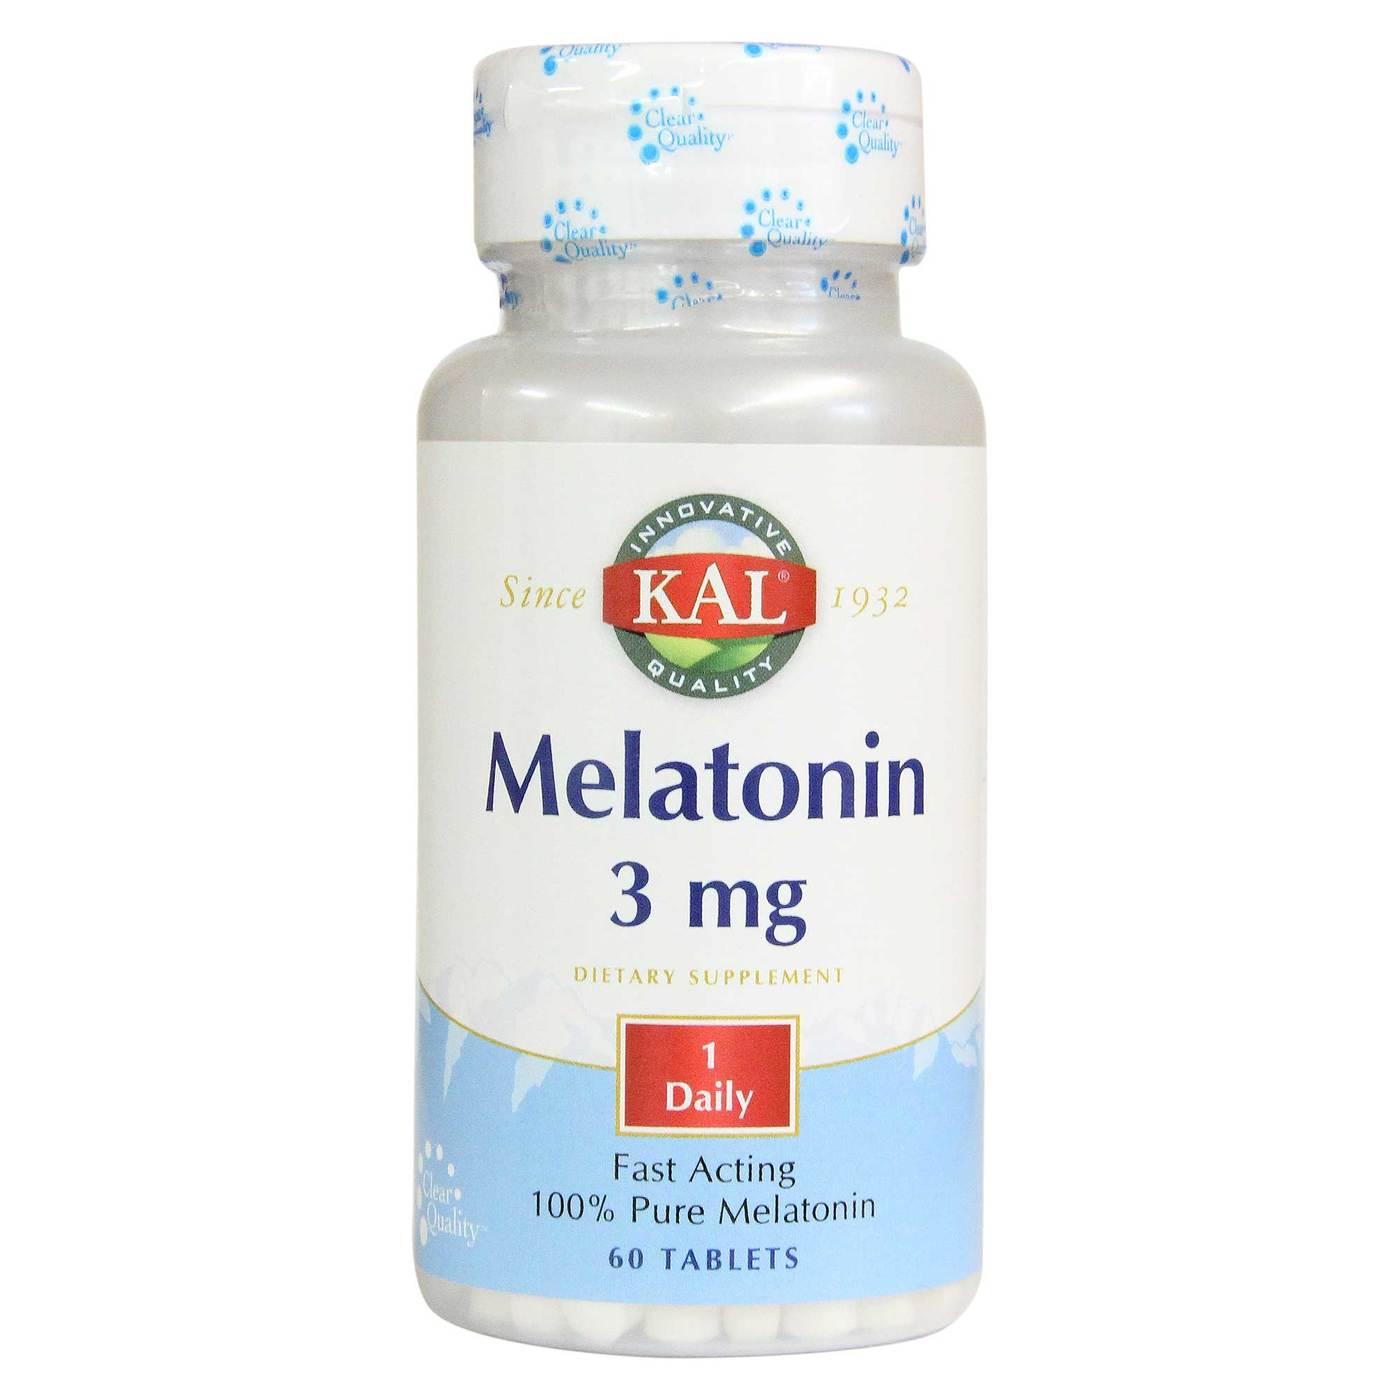 Kal Melatonin 3 Mg 120 Tablets: EVitamins.com